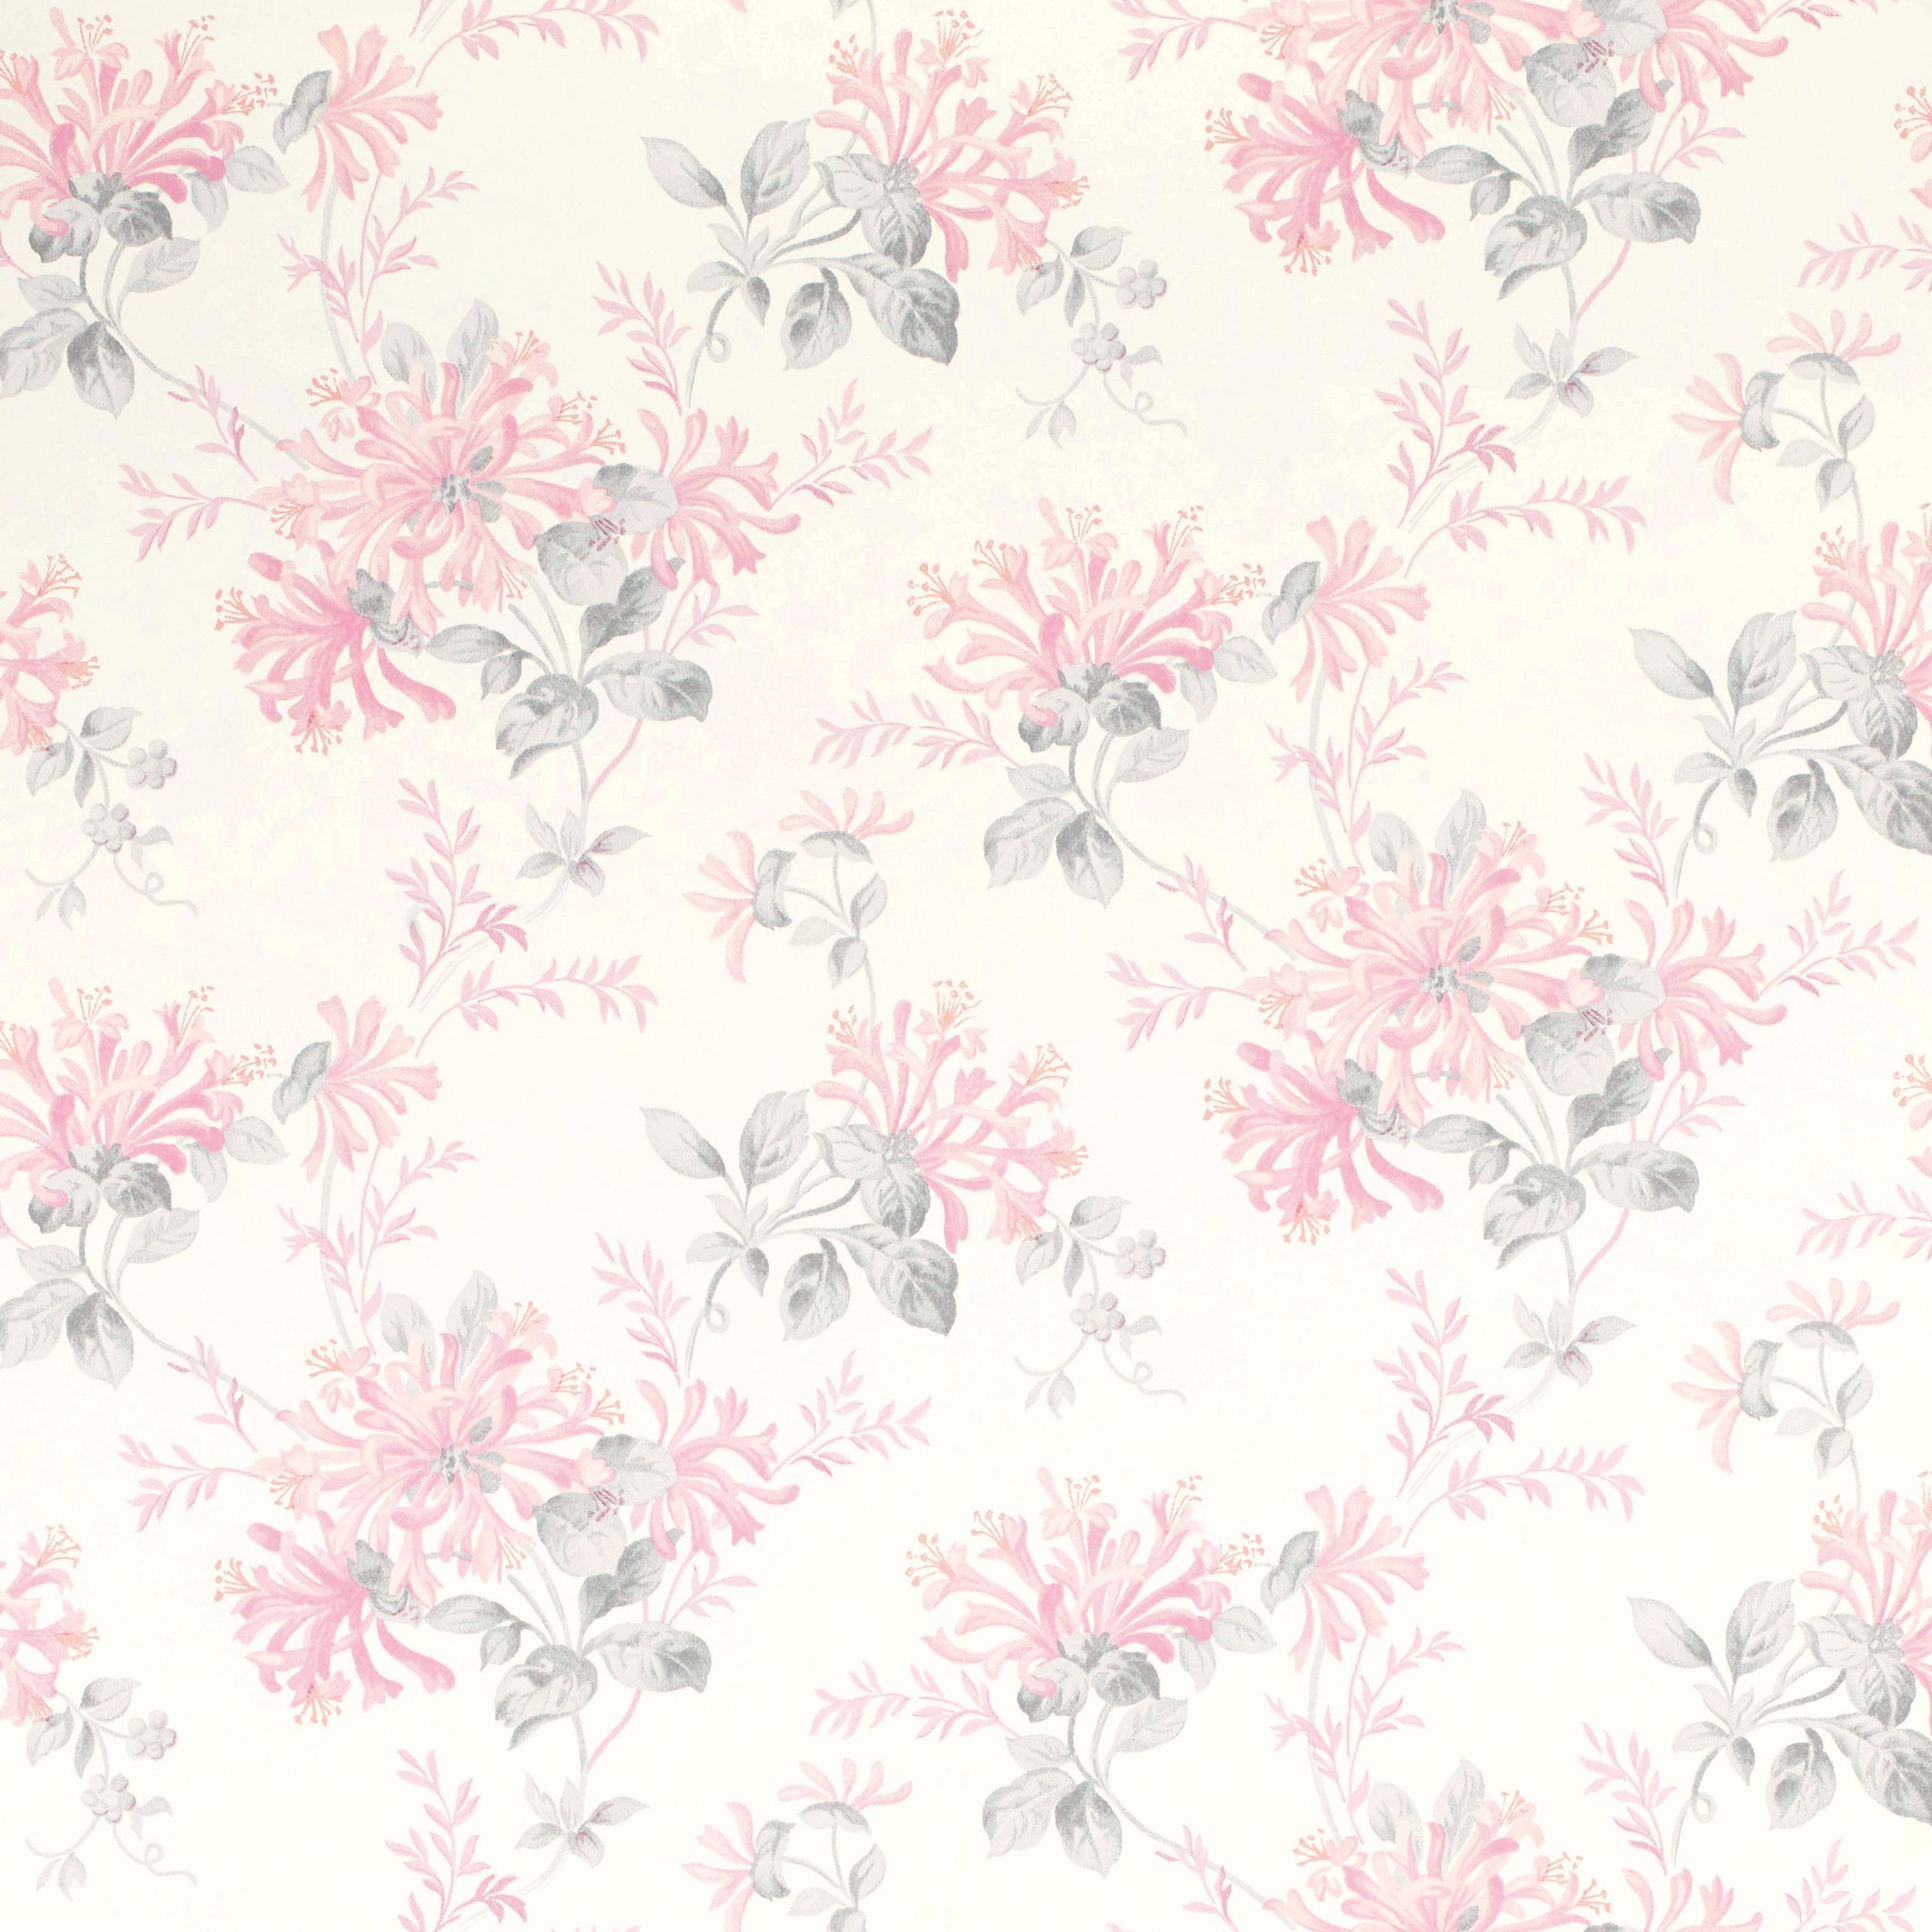 Laura ashley honeysuckle trail cyclamen floral wallpaper - Laura ashley papel pintado ...